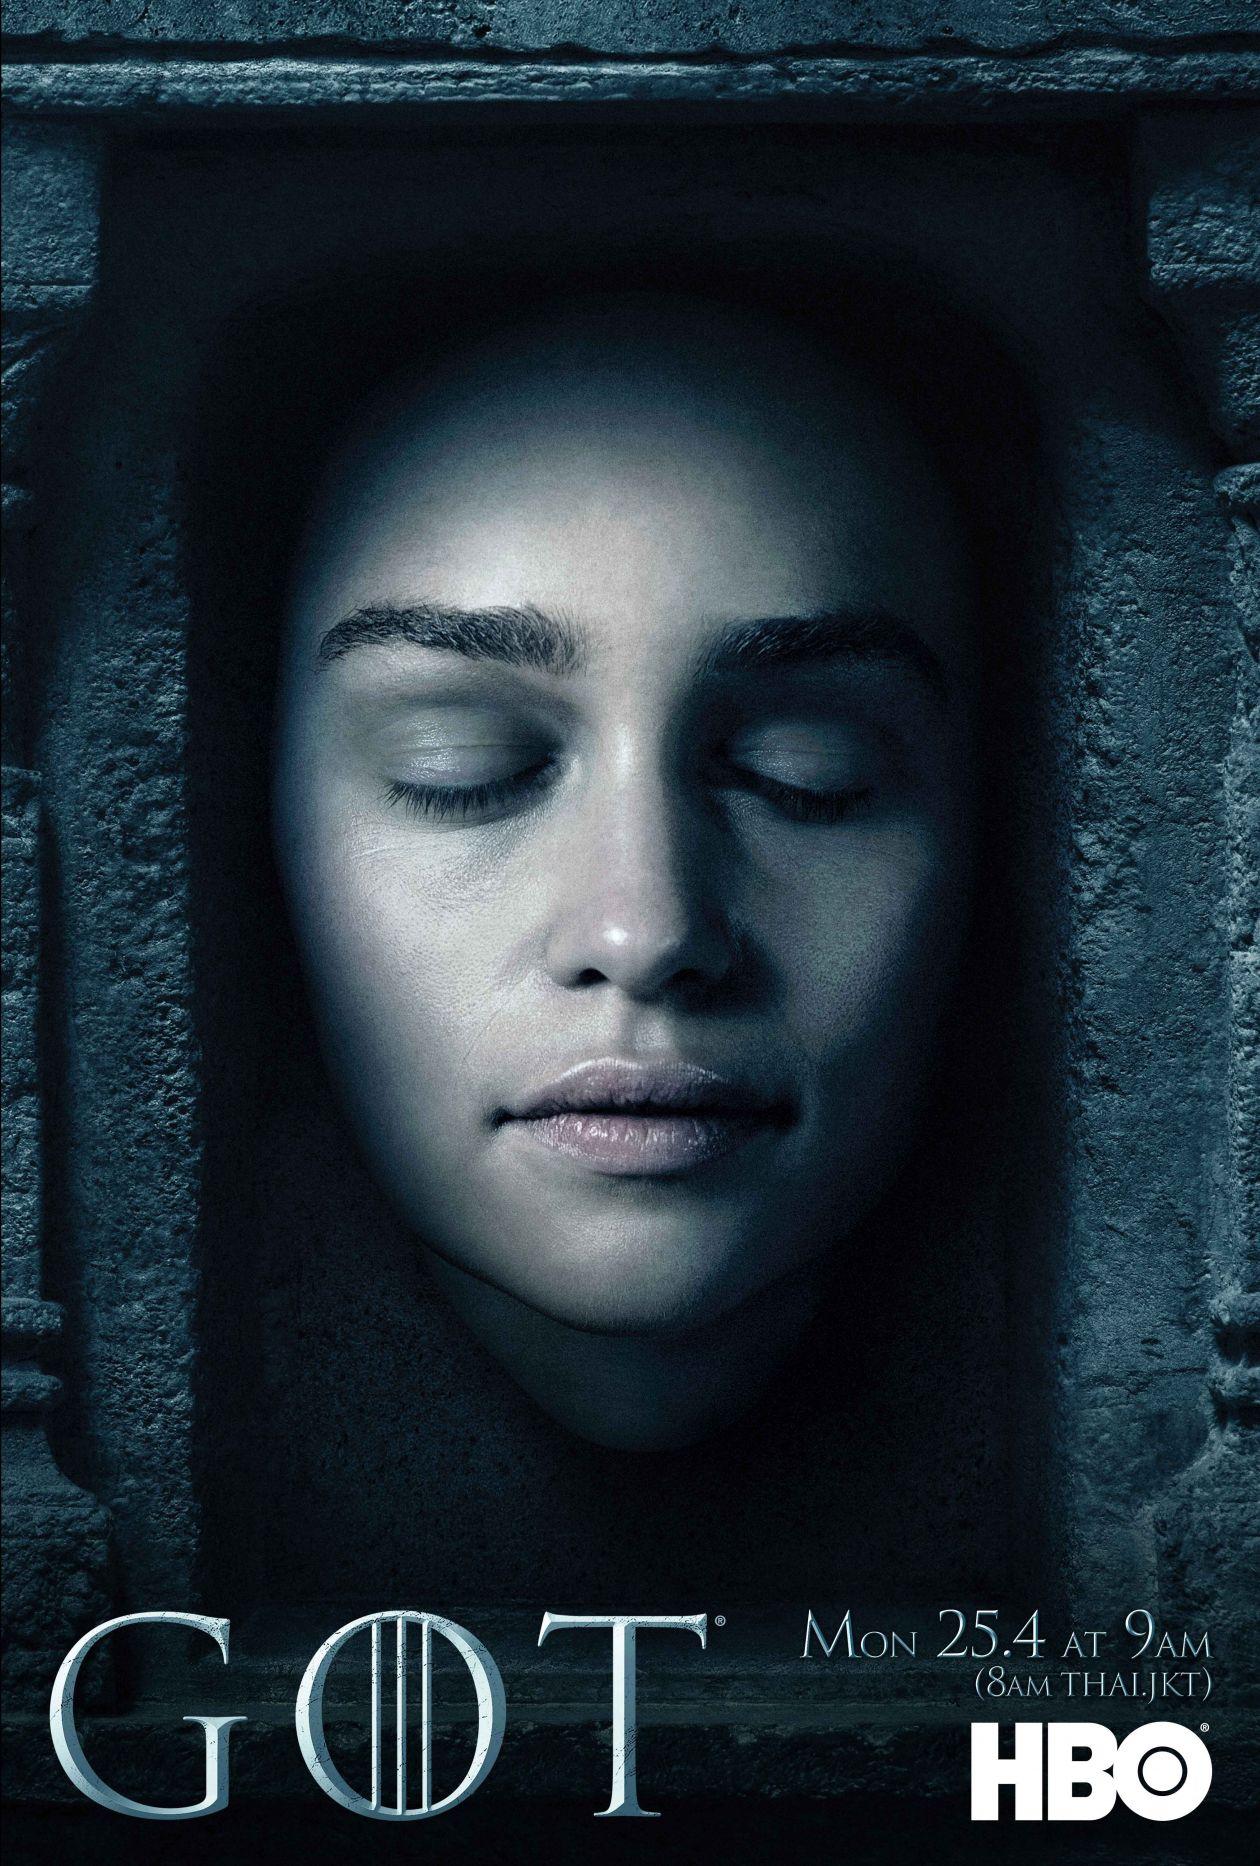 Emilia Clarke actress   Queen Daenerys Targaryen / Game of Thrones / Movie Series Season 6 Poster Affiche série Saison 6 2016